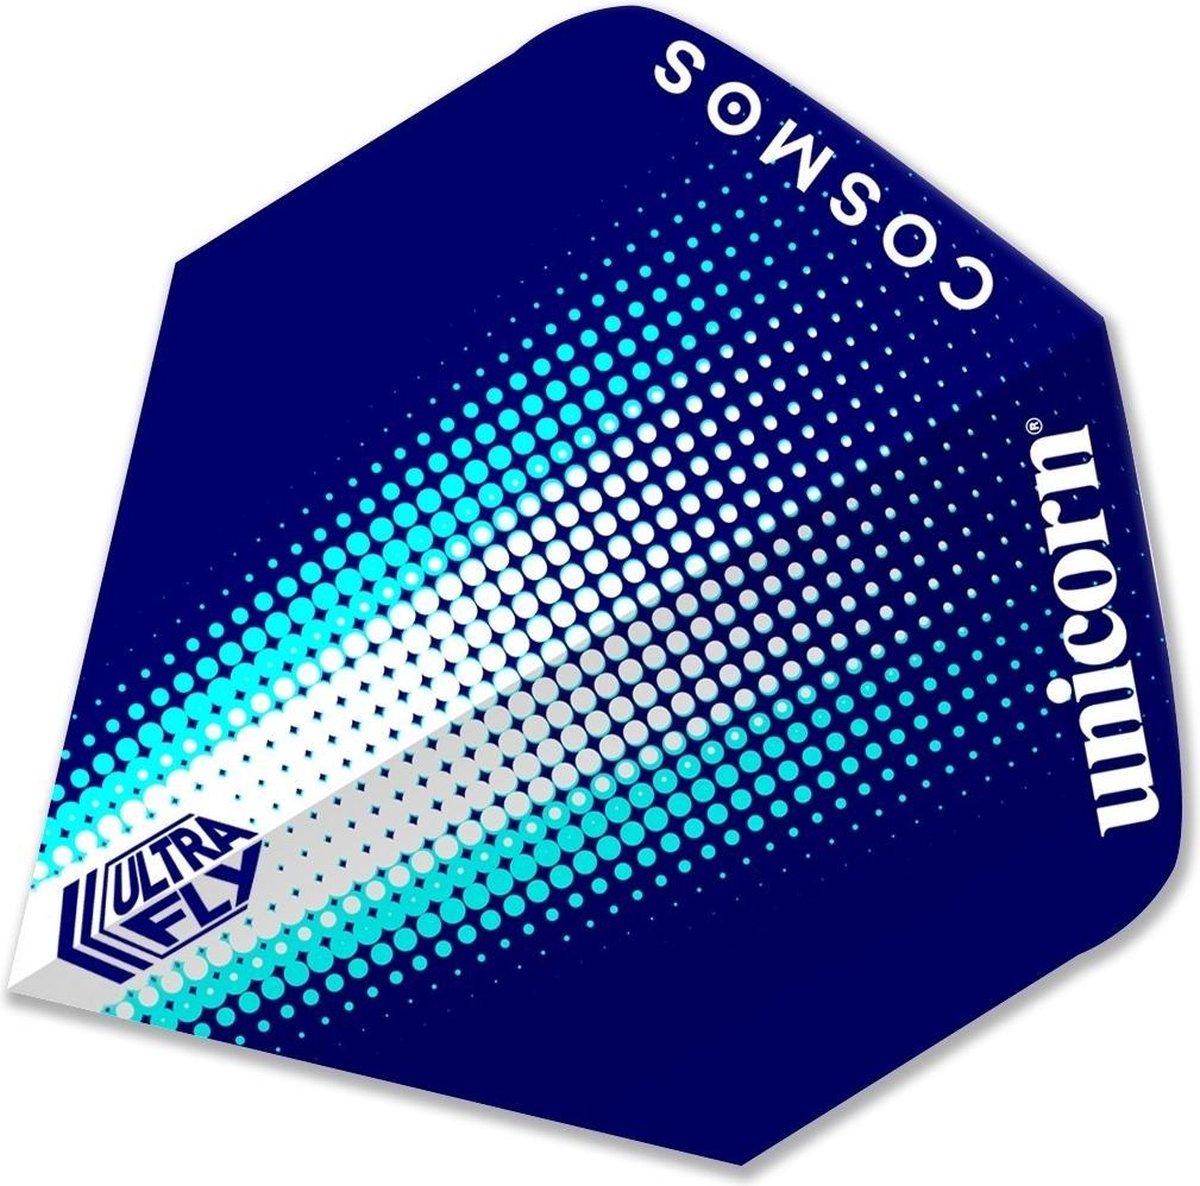 Unicorn Ultrafly Flights 100 Micron Cosmos Comet Big Wing